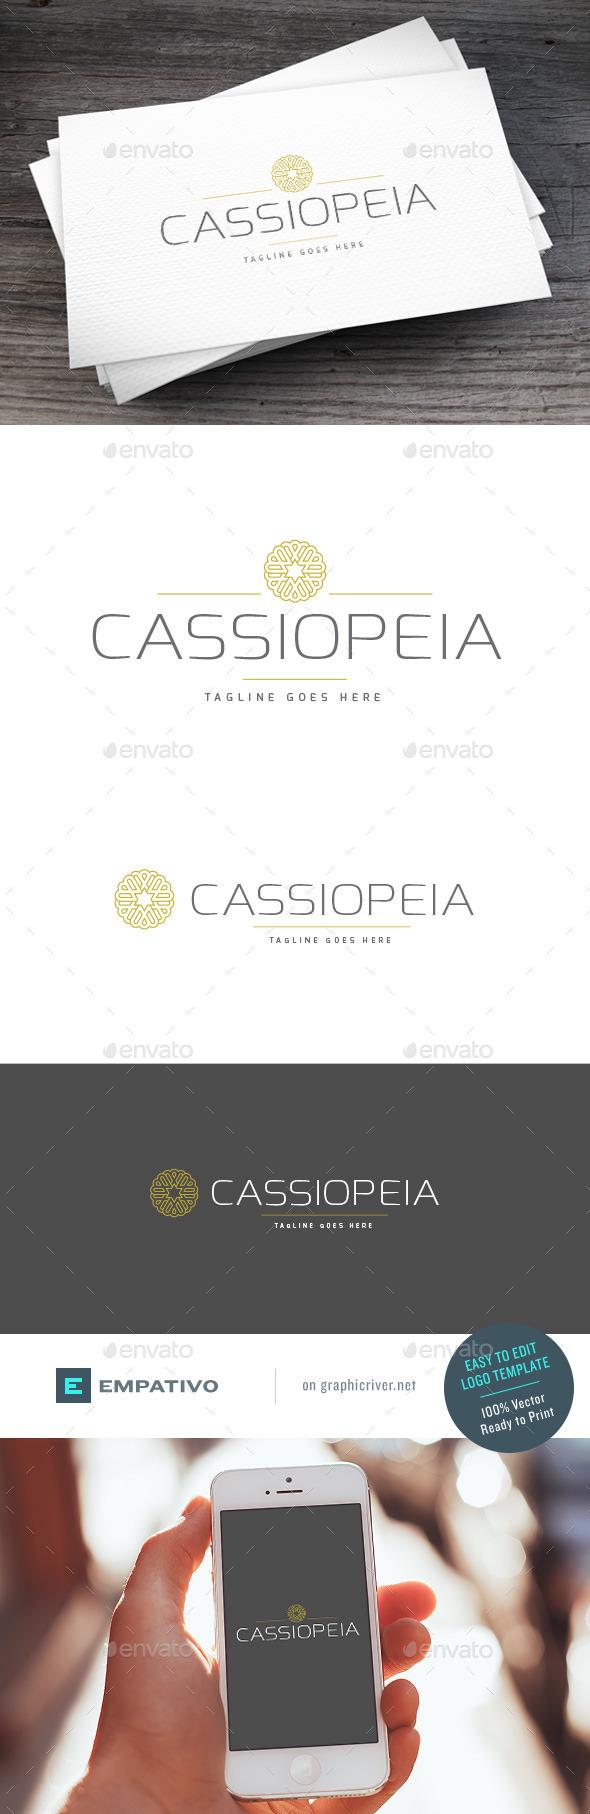 GraphicRiver Cassiopeia Logo Template 11098060